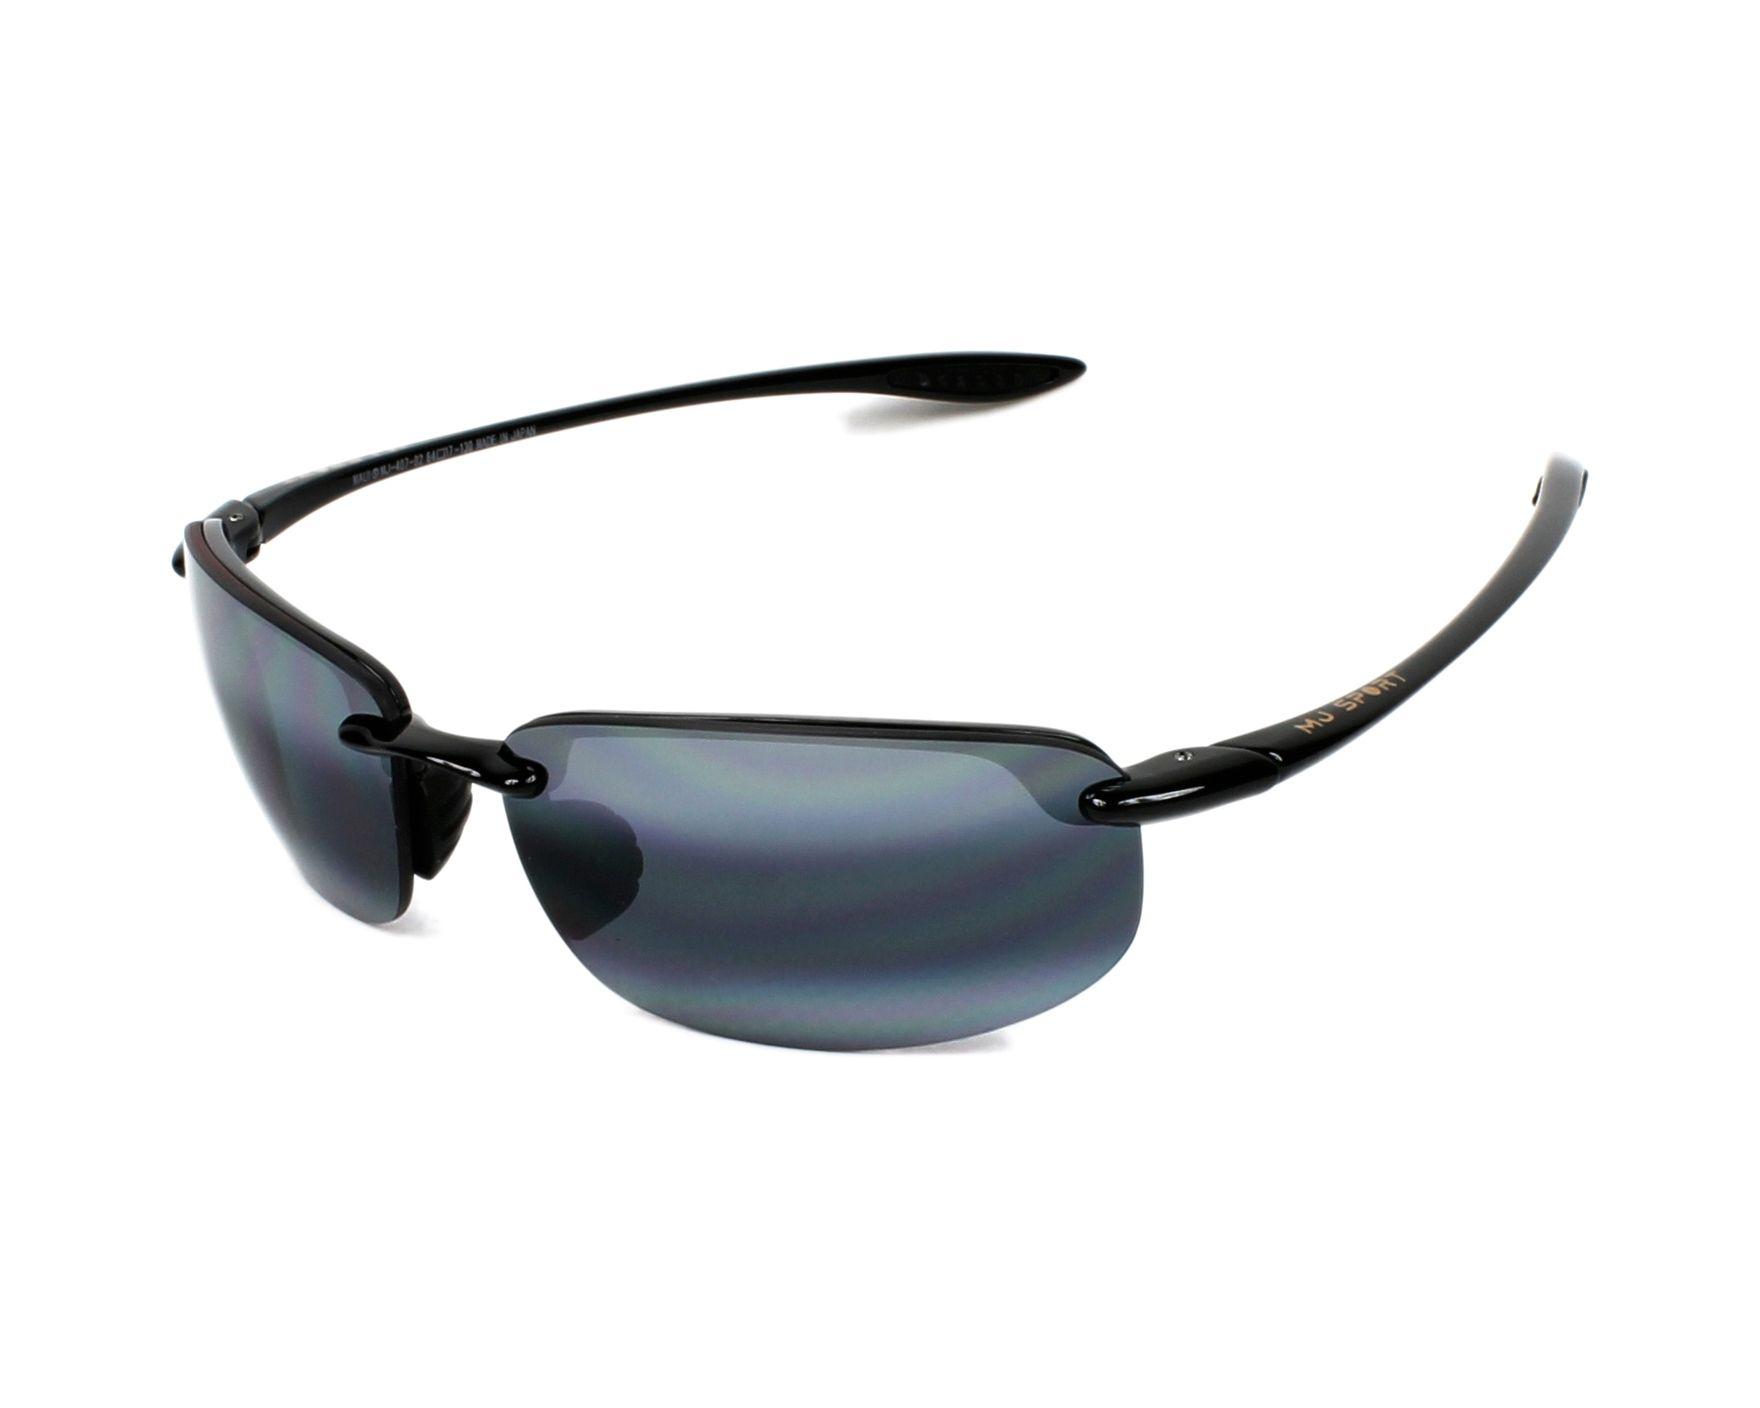 Sunglasses Maui Jim 407 02 64-17 Black profile view b6a74a71fb6c